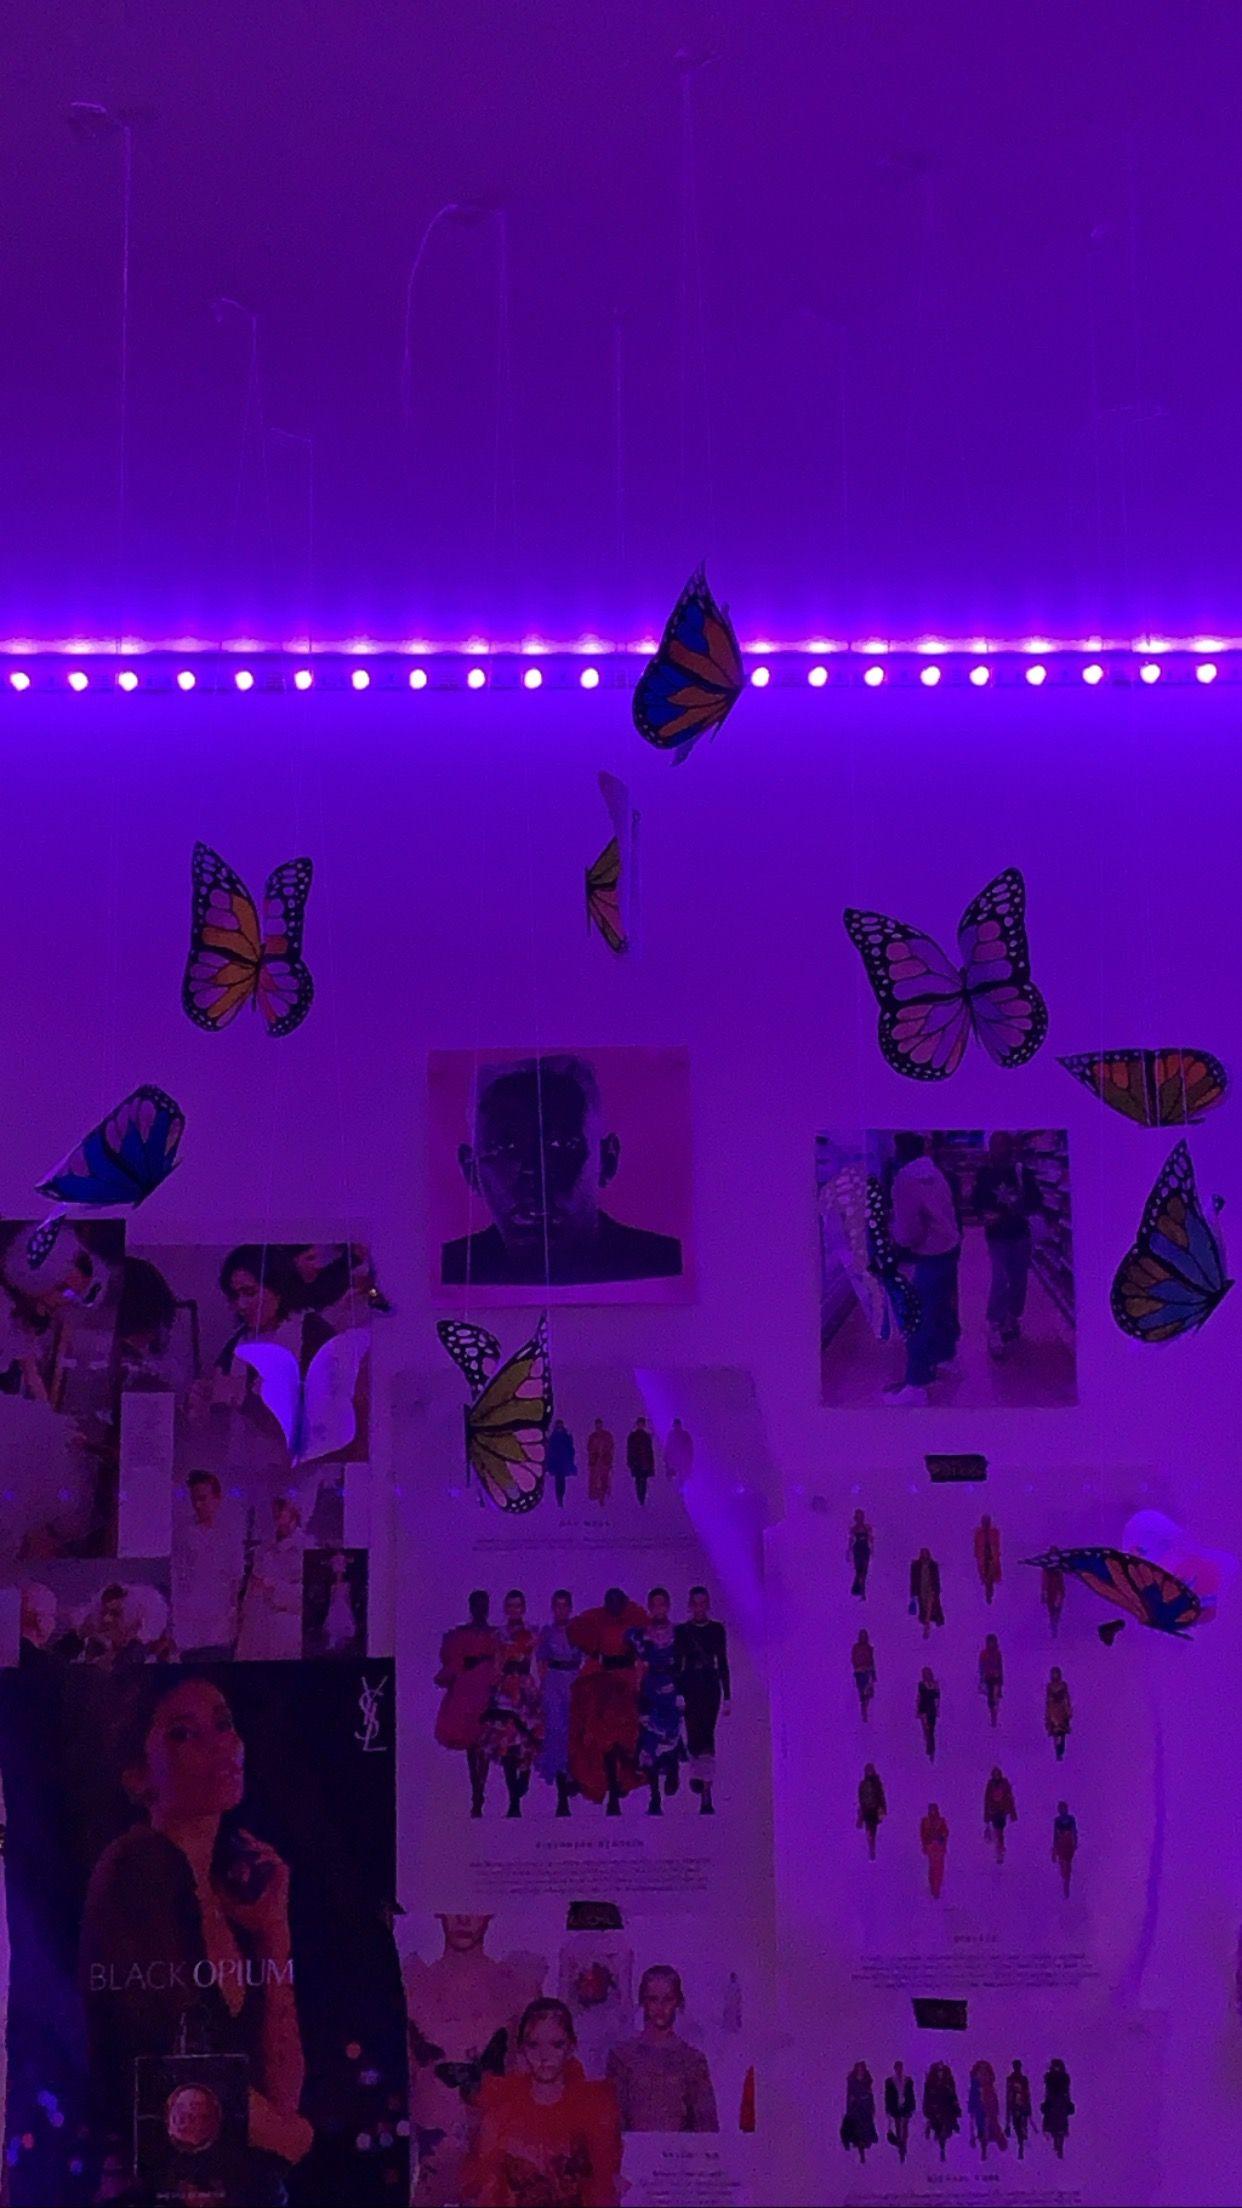 Aesthetic Room Decor Butterfly Room Decor Butterfly Room Aesthetic Room Decor